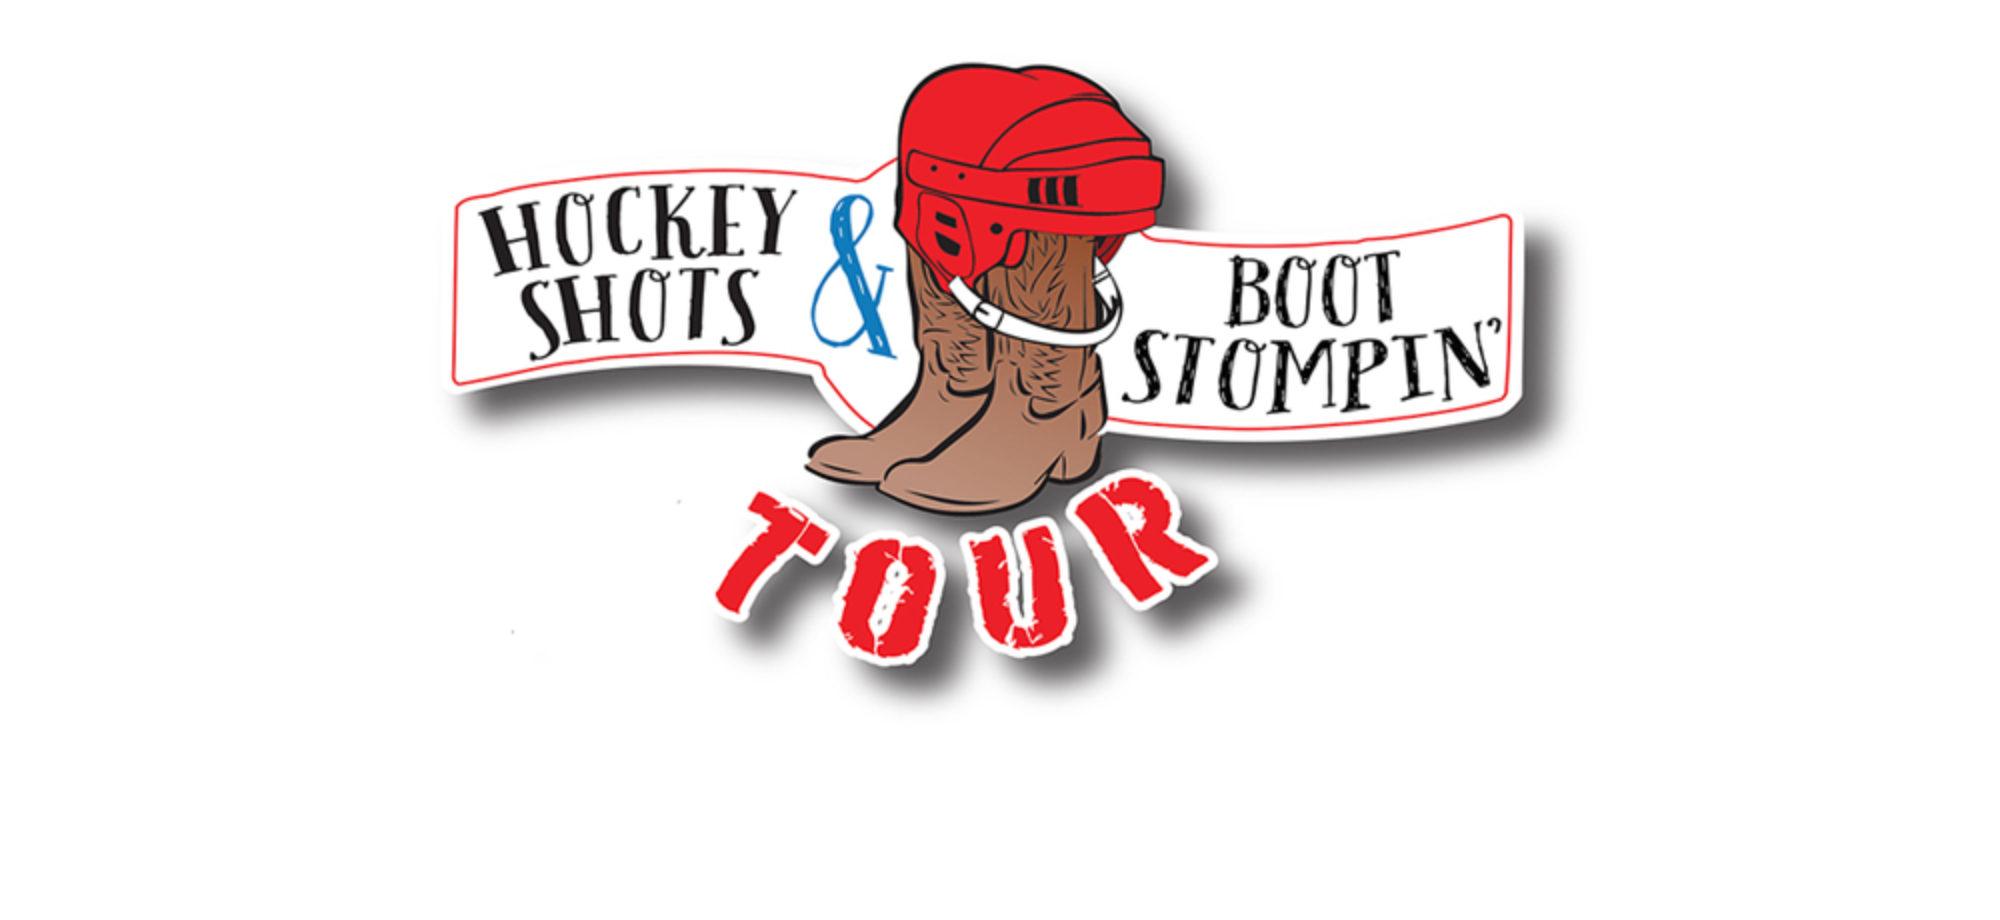 Pro Stars Hockey Tours